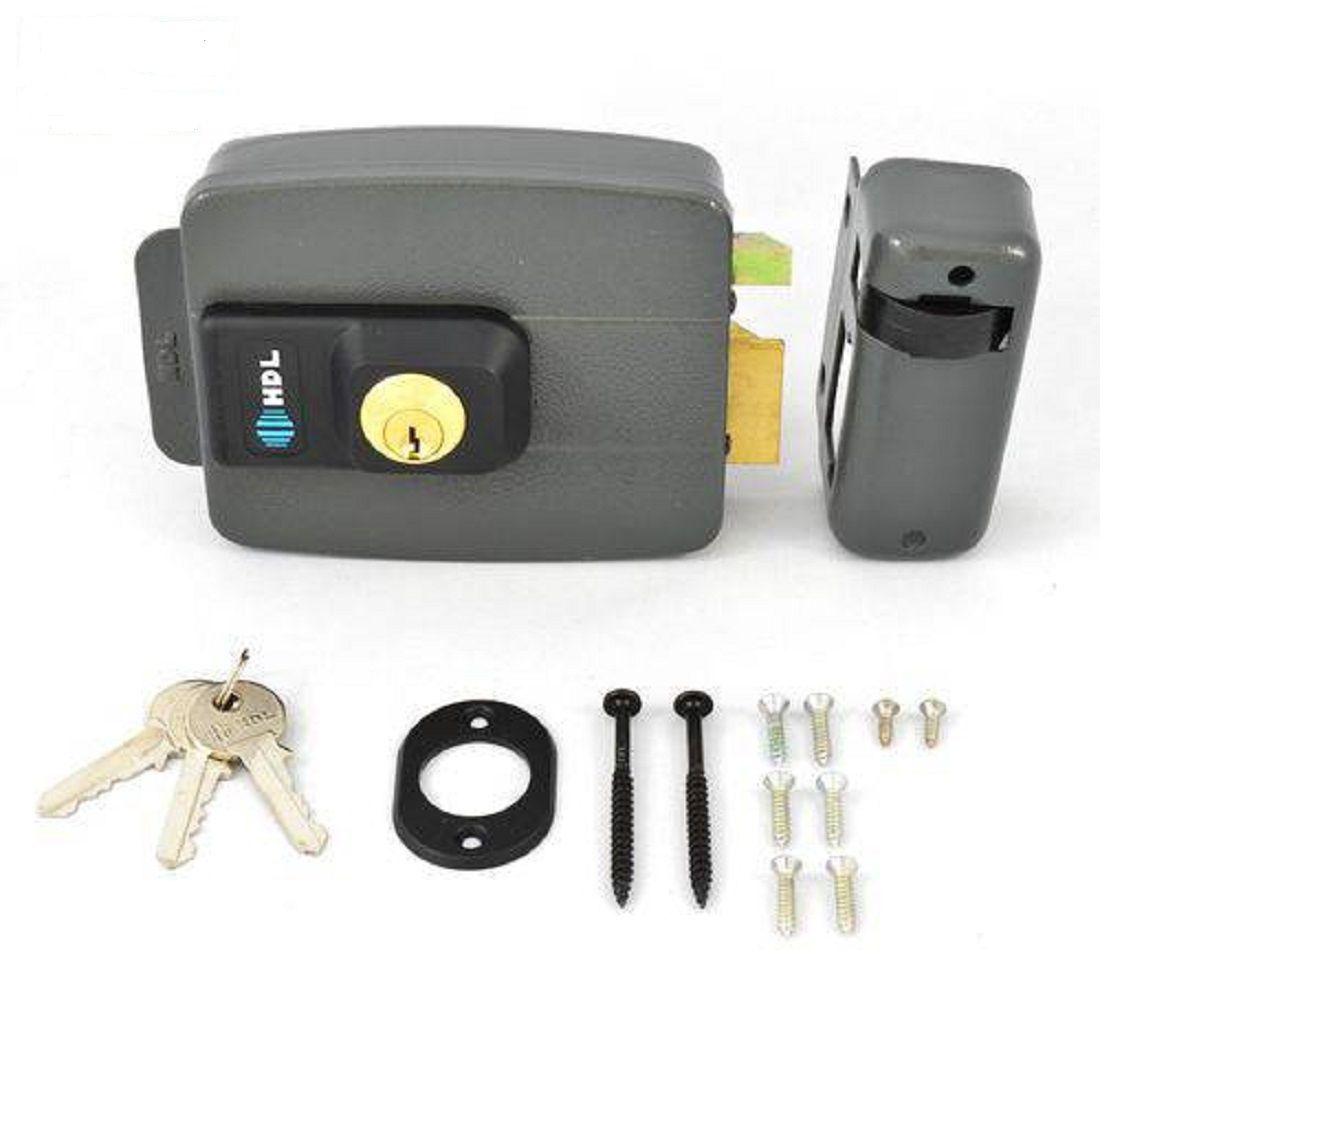 Kit Porteiro Residencial Intelbras IPR 8010 + Fechadura Elétrica de Sobrepor HDL